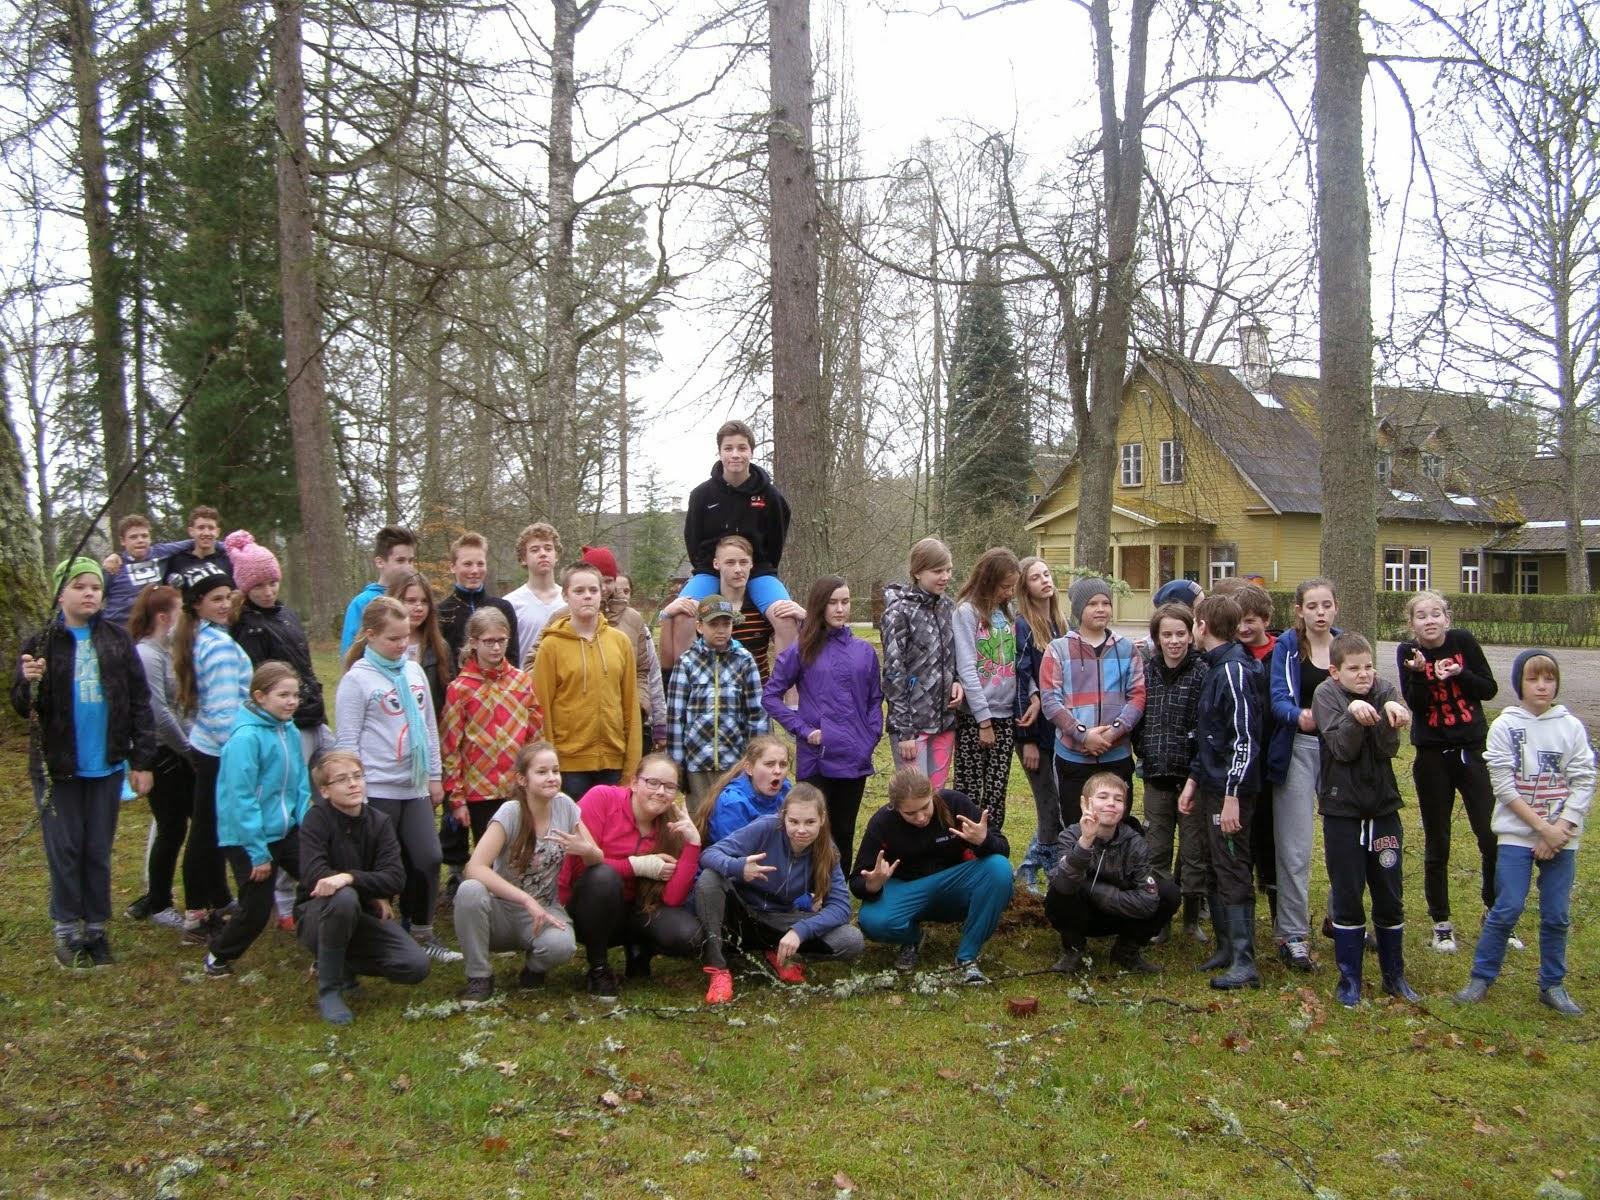 Metsa istutajad 2015